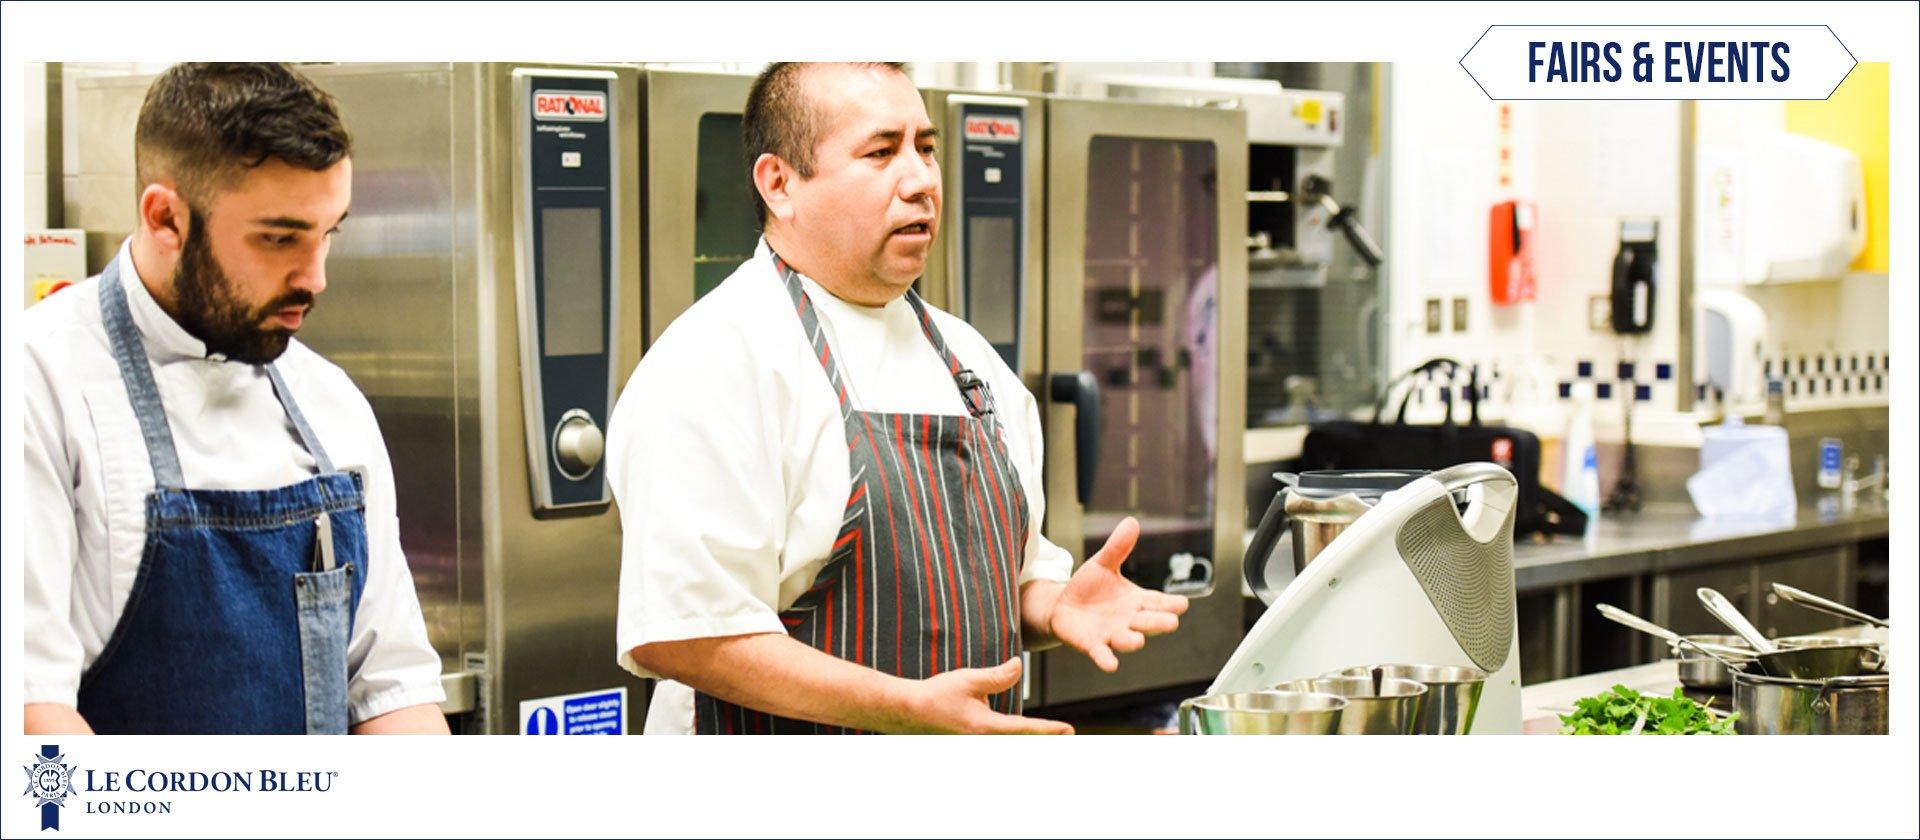 Chef Robert Ortiz in front of Le Cordon Bleu London audience